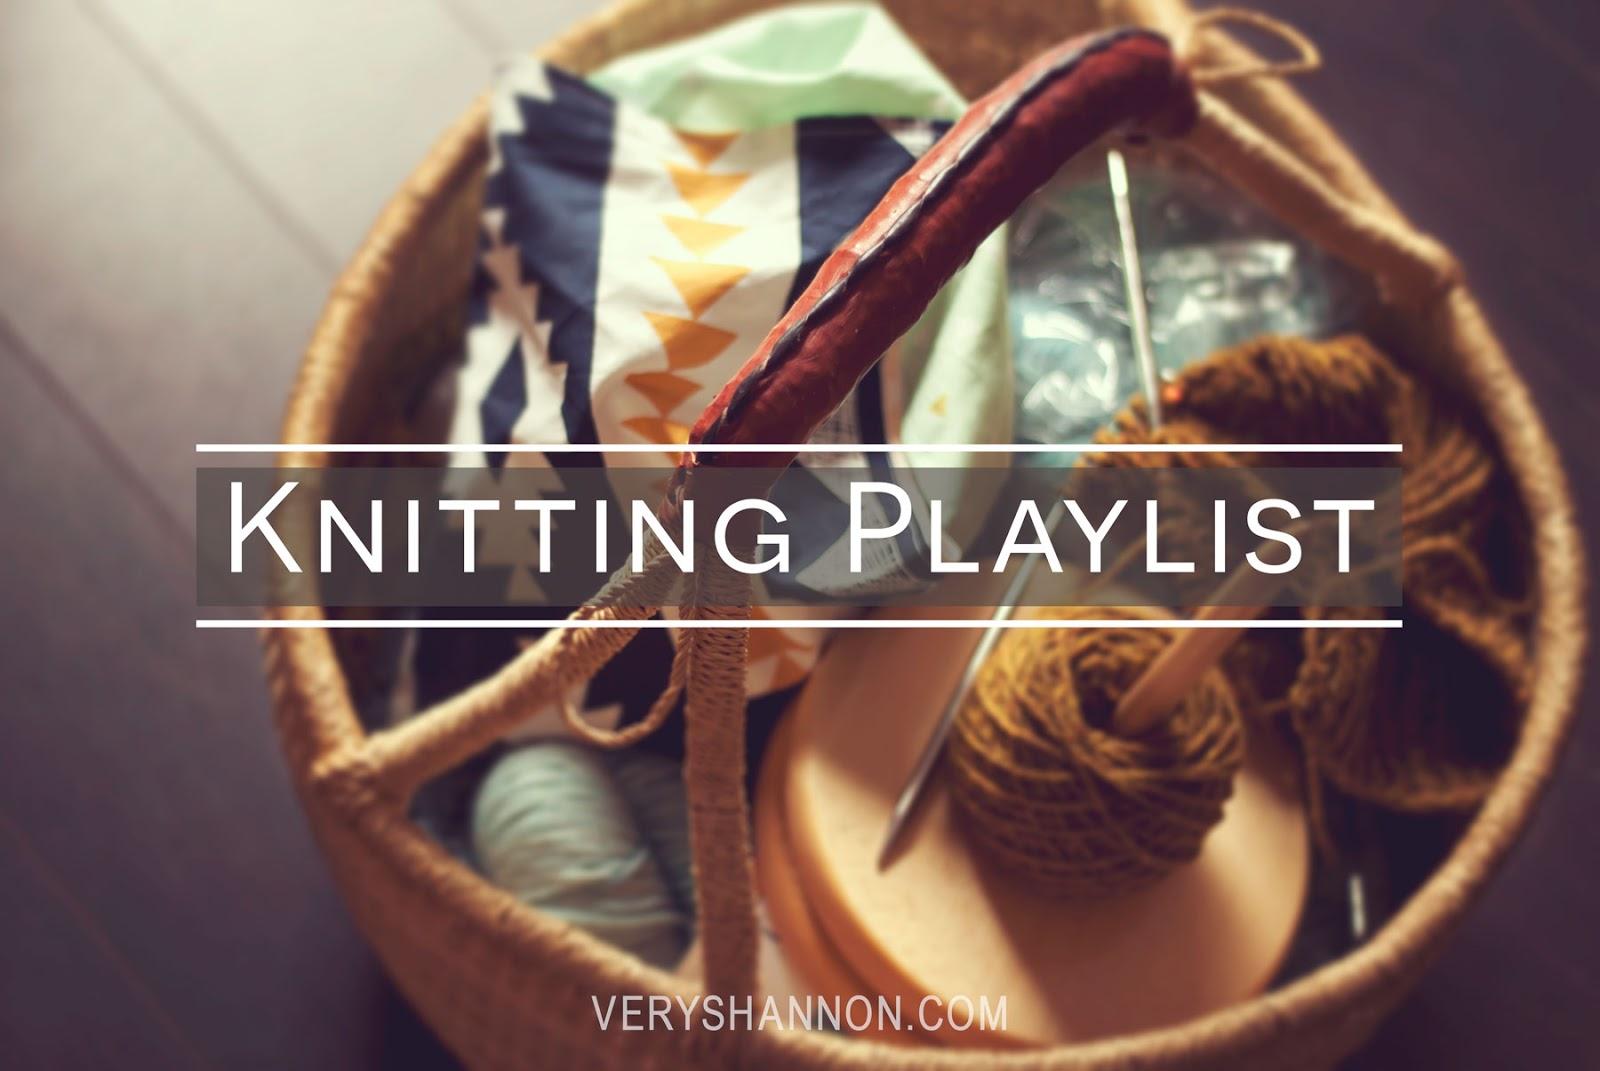 knittingplaylist.jpg